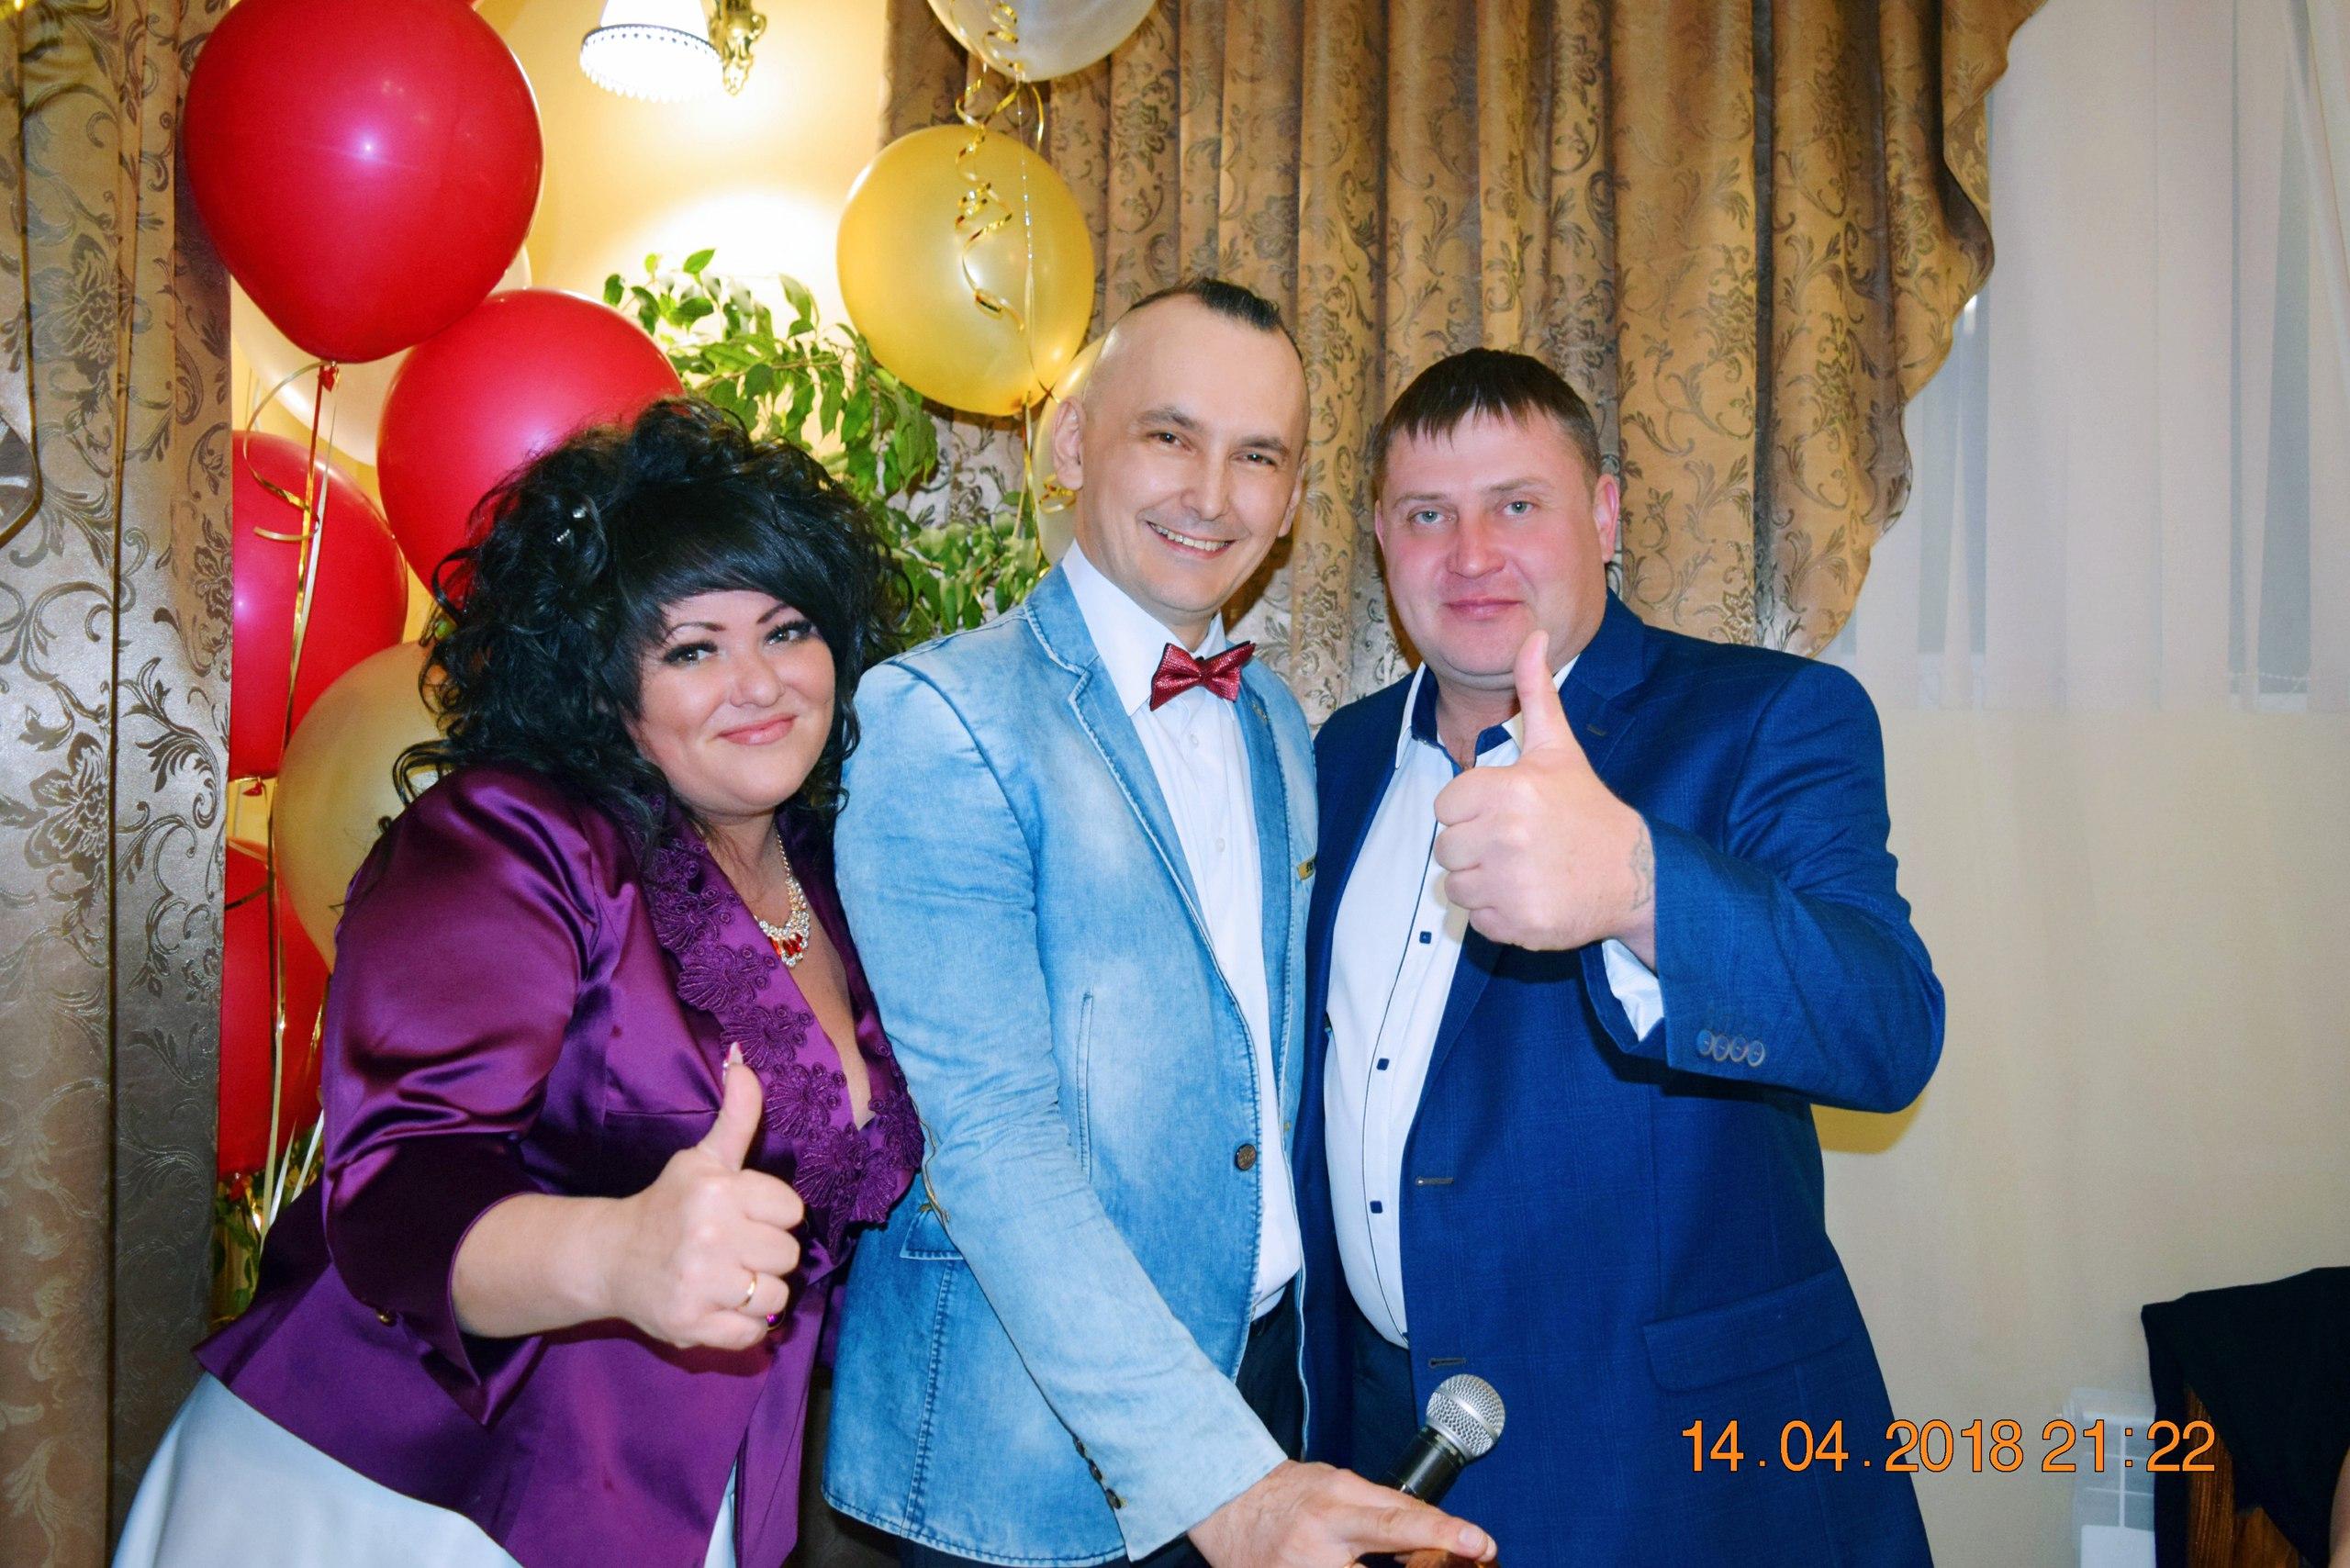 6 cKzkzNe1Q - Свадьба Дениса и Карины